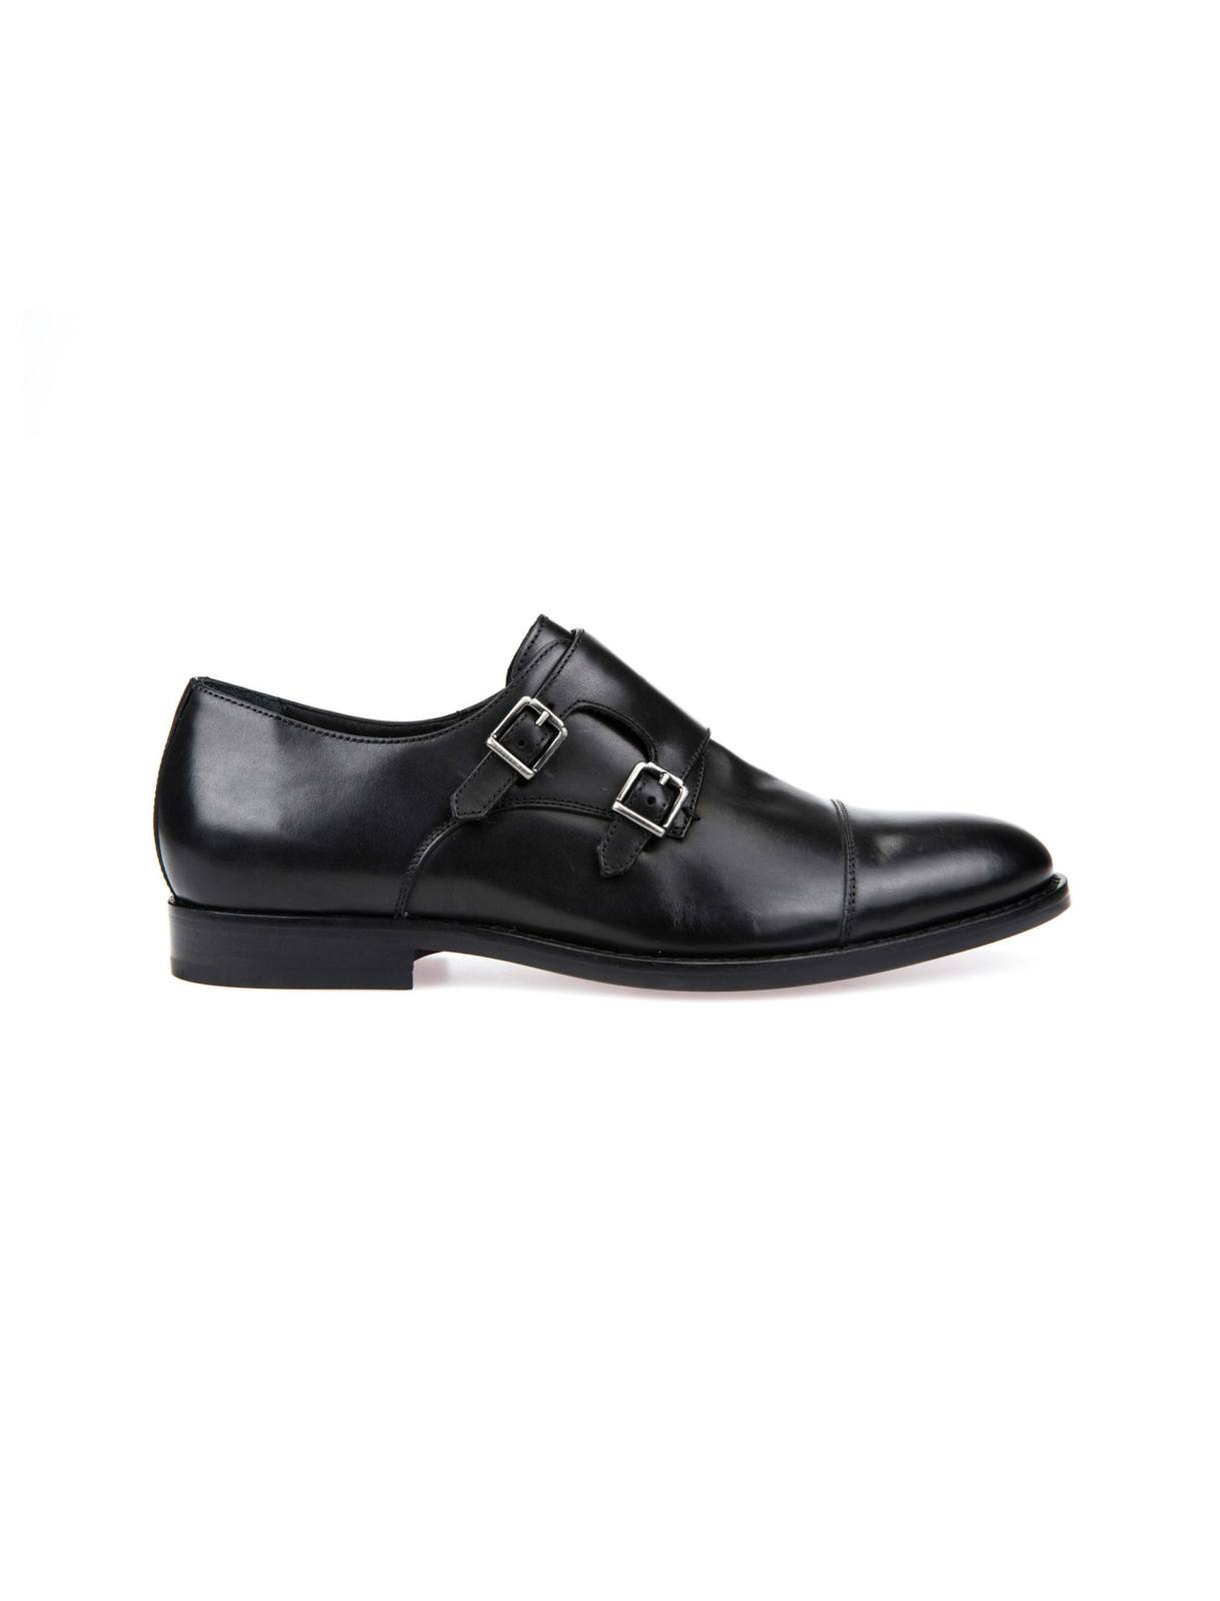 کفش رسمی چرم مردانه HAMPSTEAD – جی اوکس  Men Formal Leather Shoes HAMPSTEAD – Geox